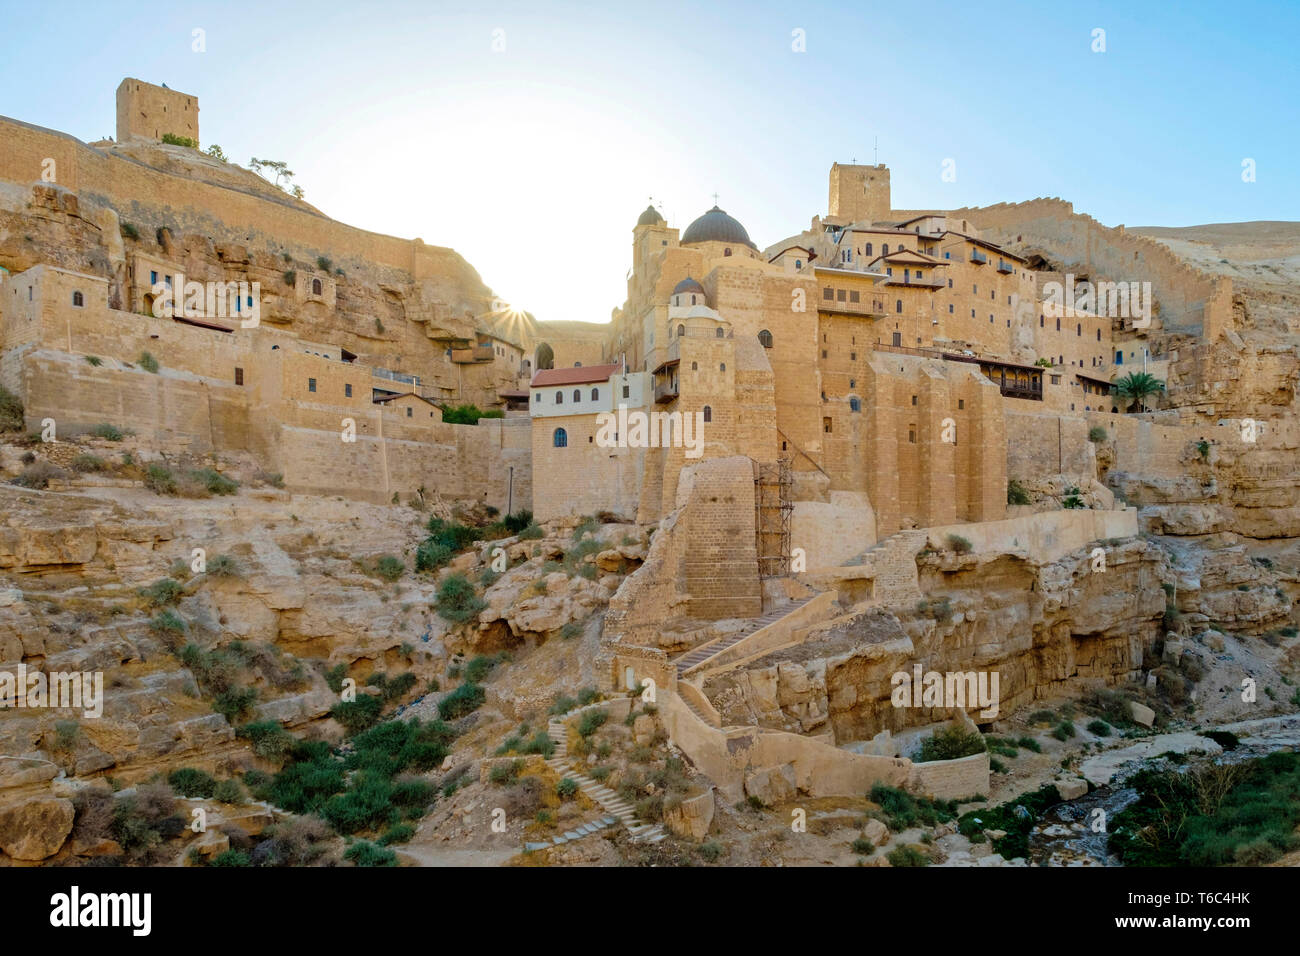 Palestine, West Bank, Bethlehem Governorate, Al-Ubeidiya. Mar Saba monastery, built into the cliffs of the Kidron Valley in the Judean Desert. - Stock Image